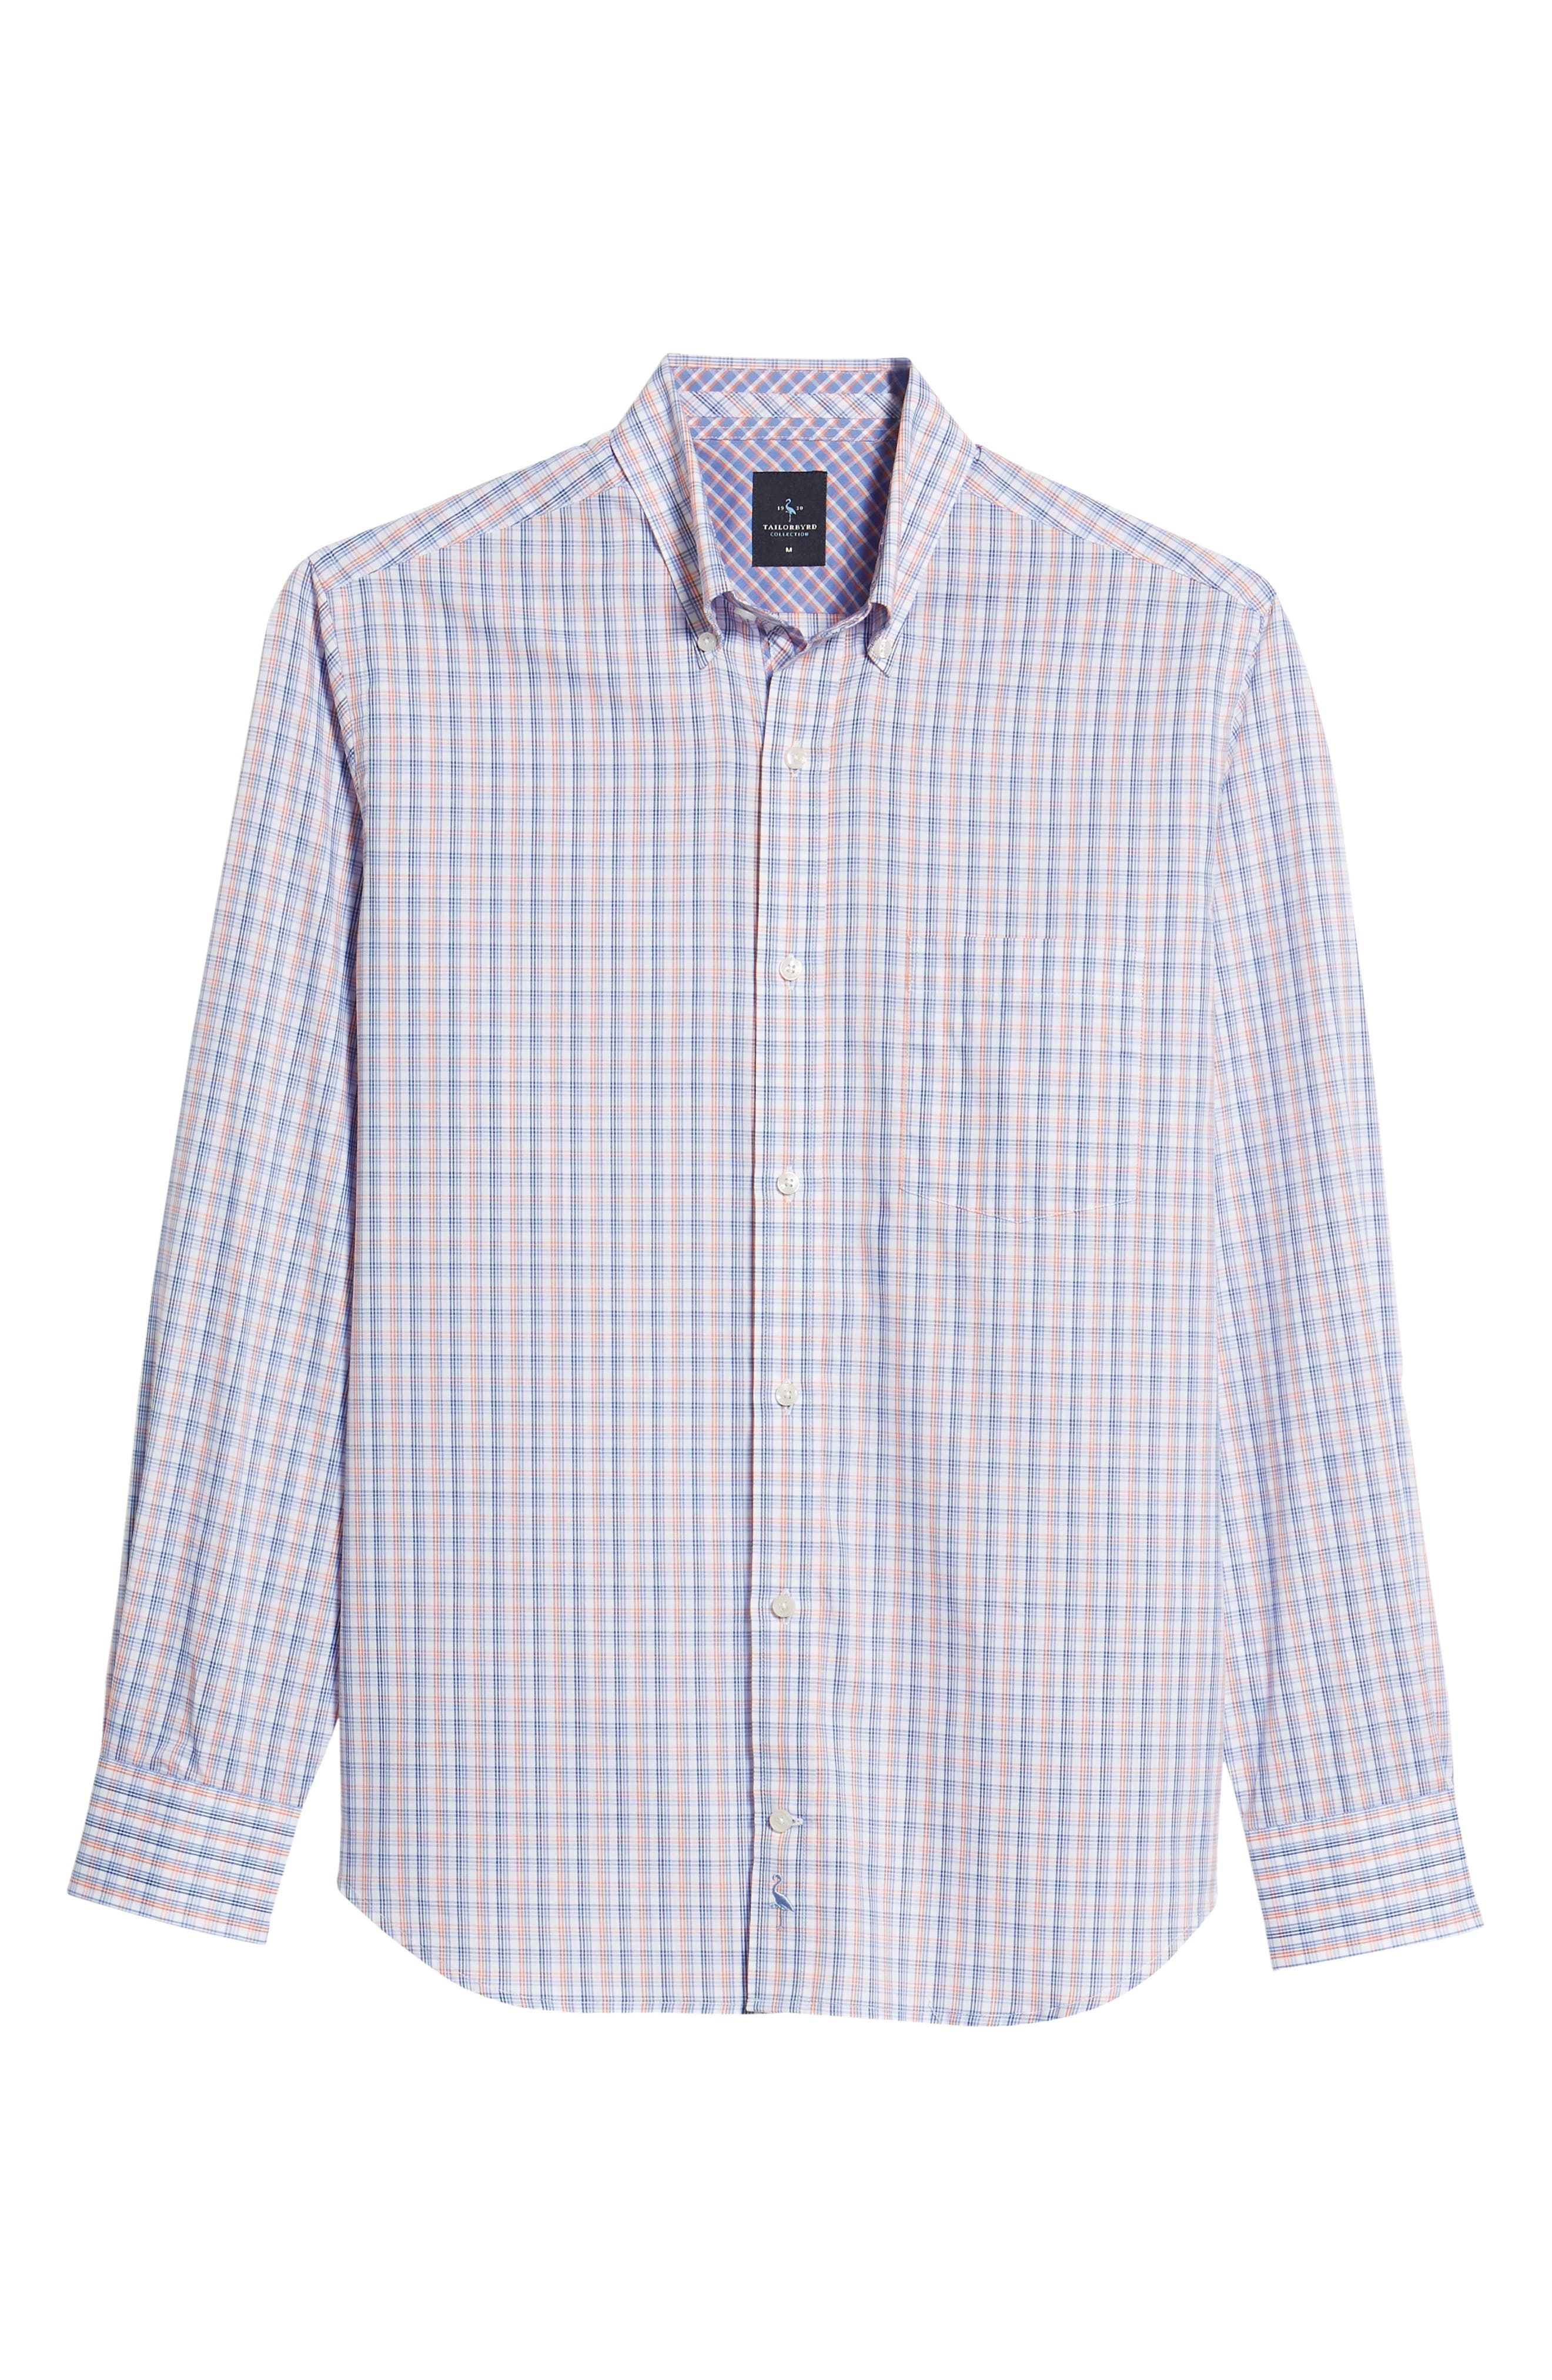 Adon Regular Fit Plaid Sport Shirt,                             Alternate thumbnail 6, color,                             Orange